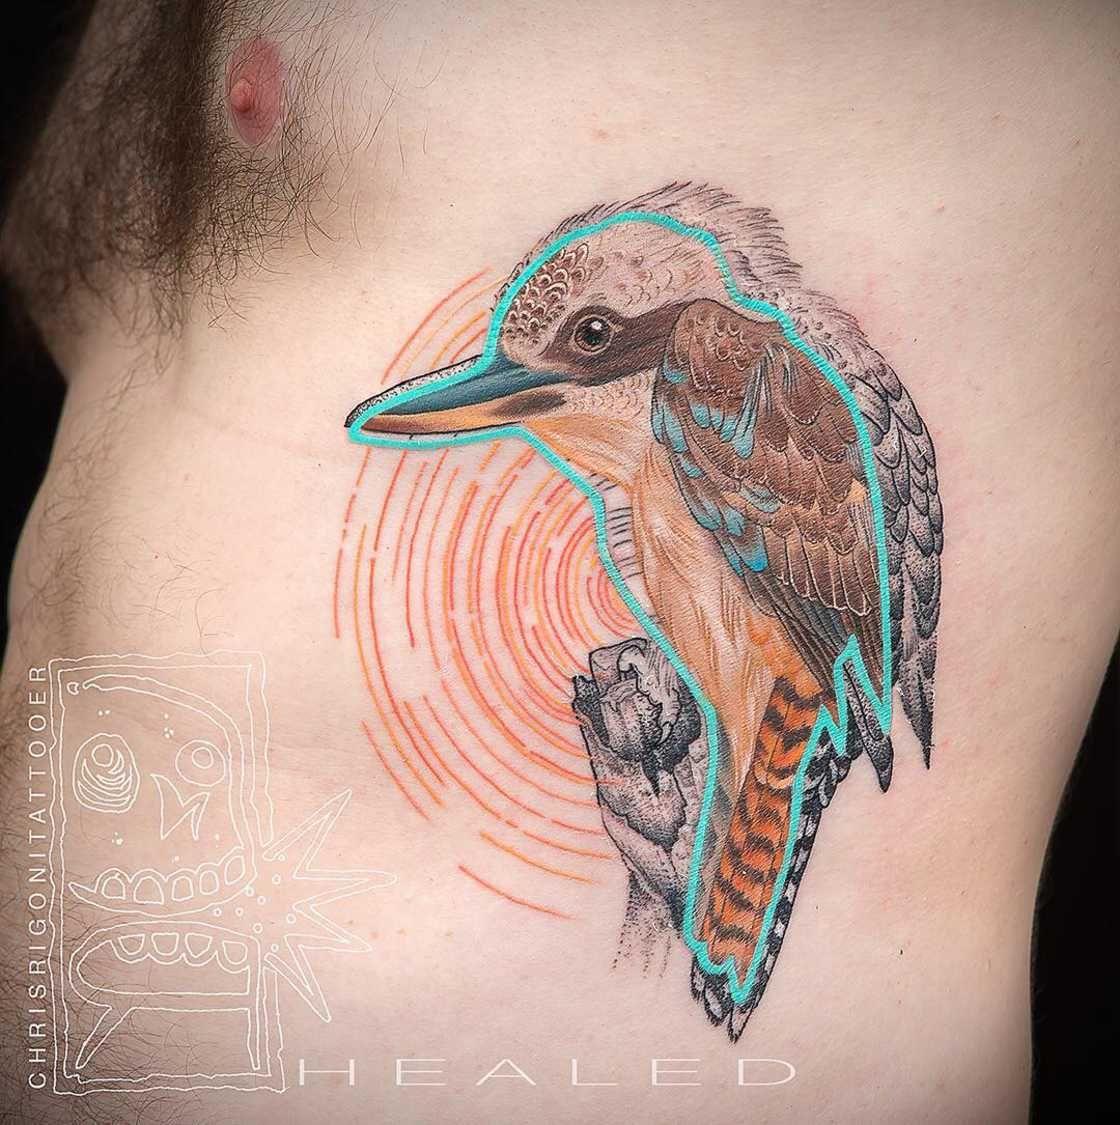 As tatuagens ultracoloridas de chris rigoni tattoo tatoo and tattos